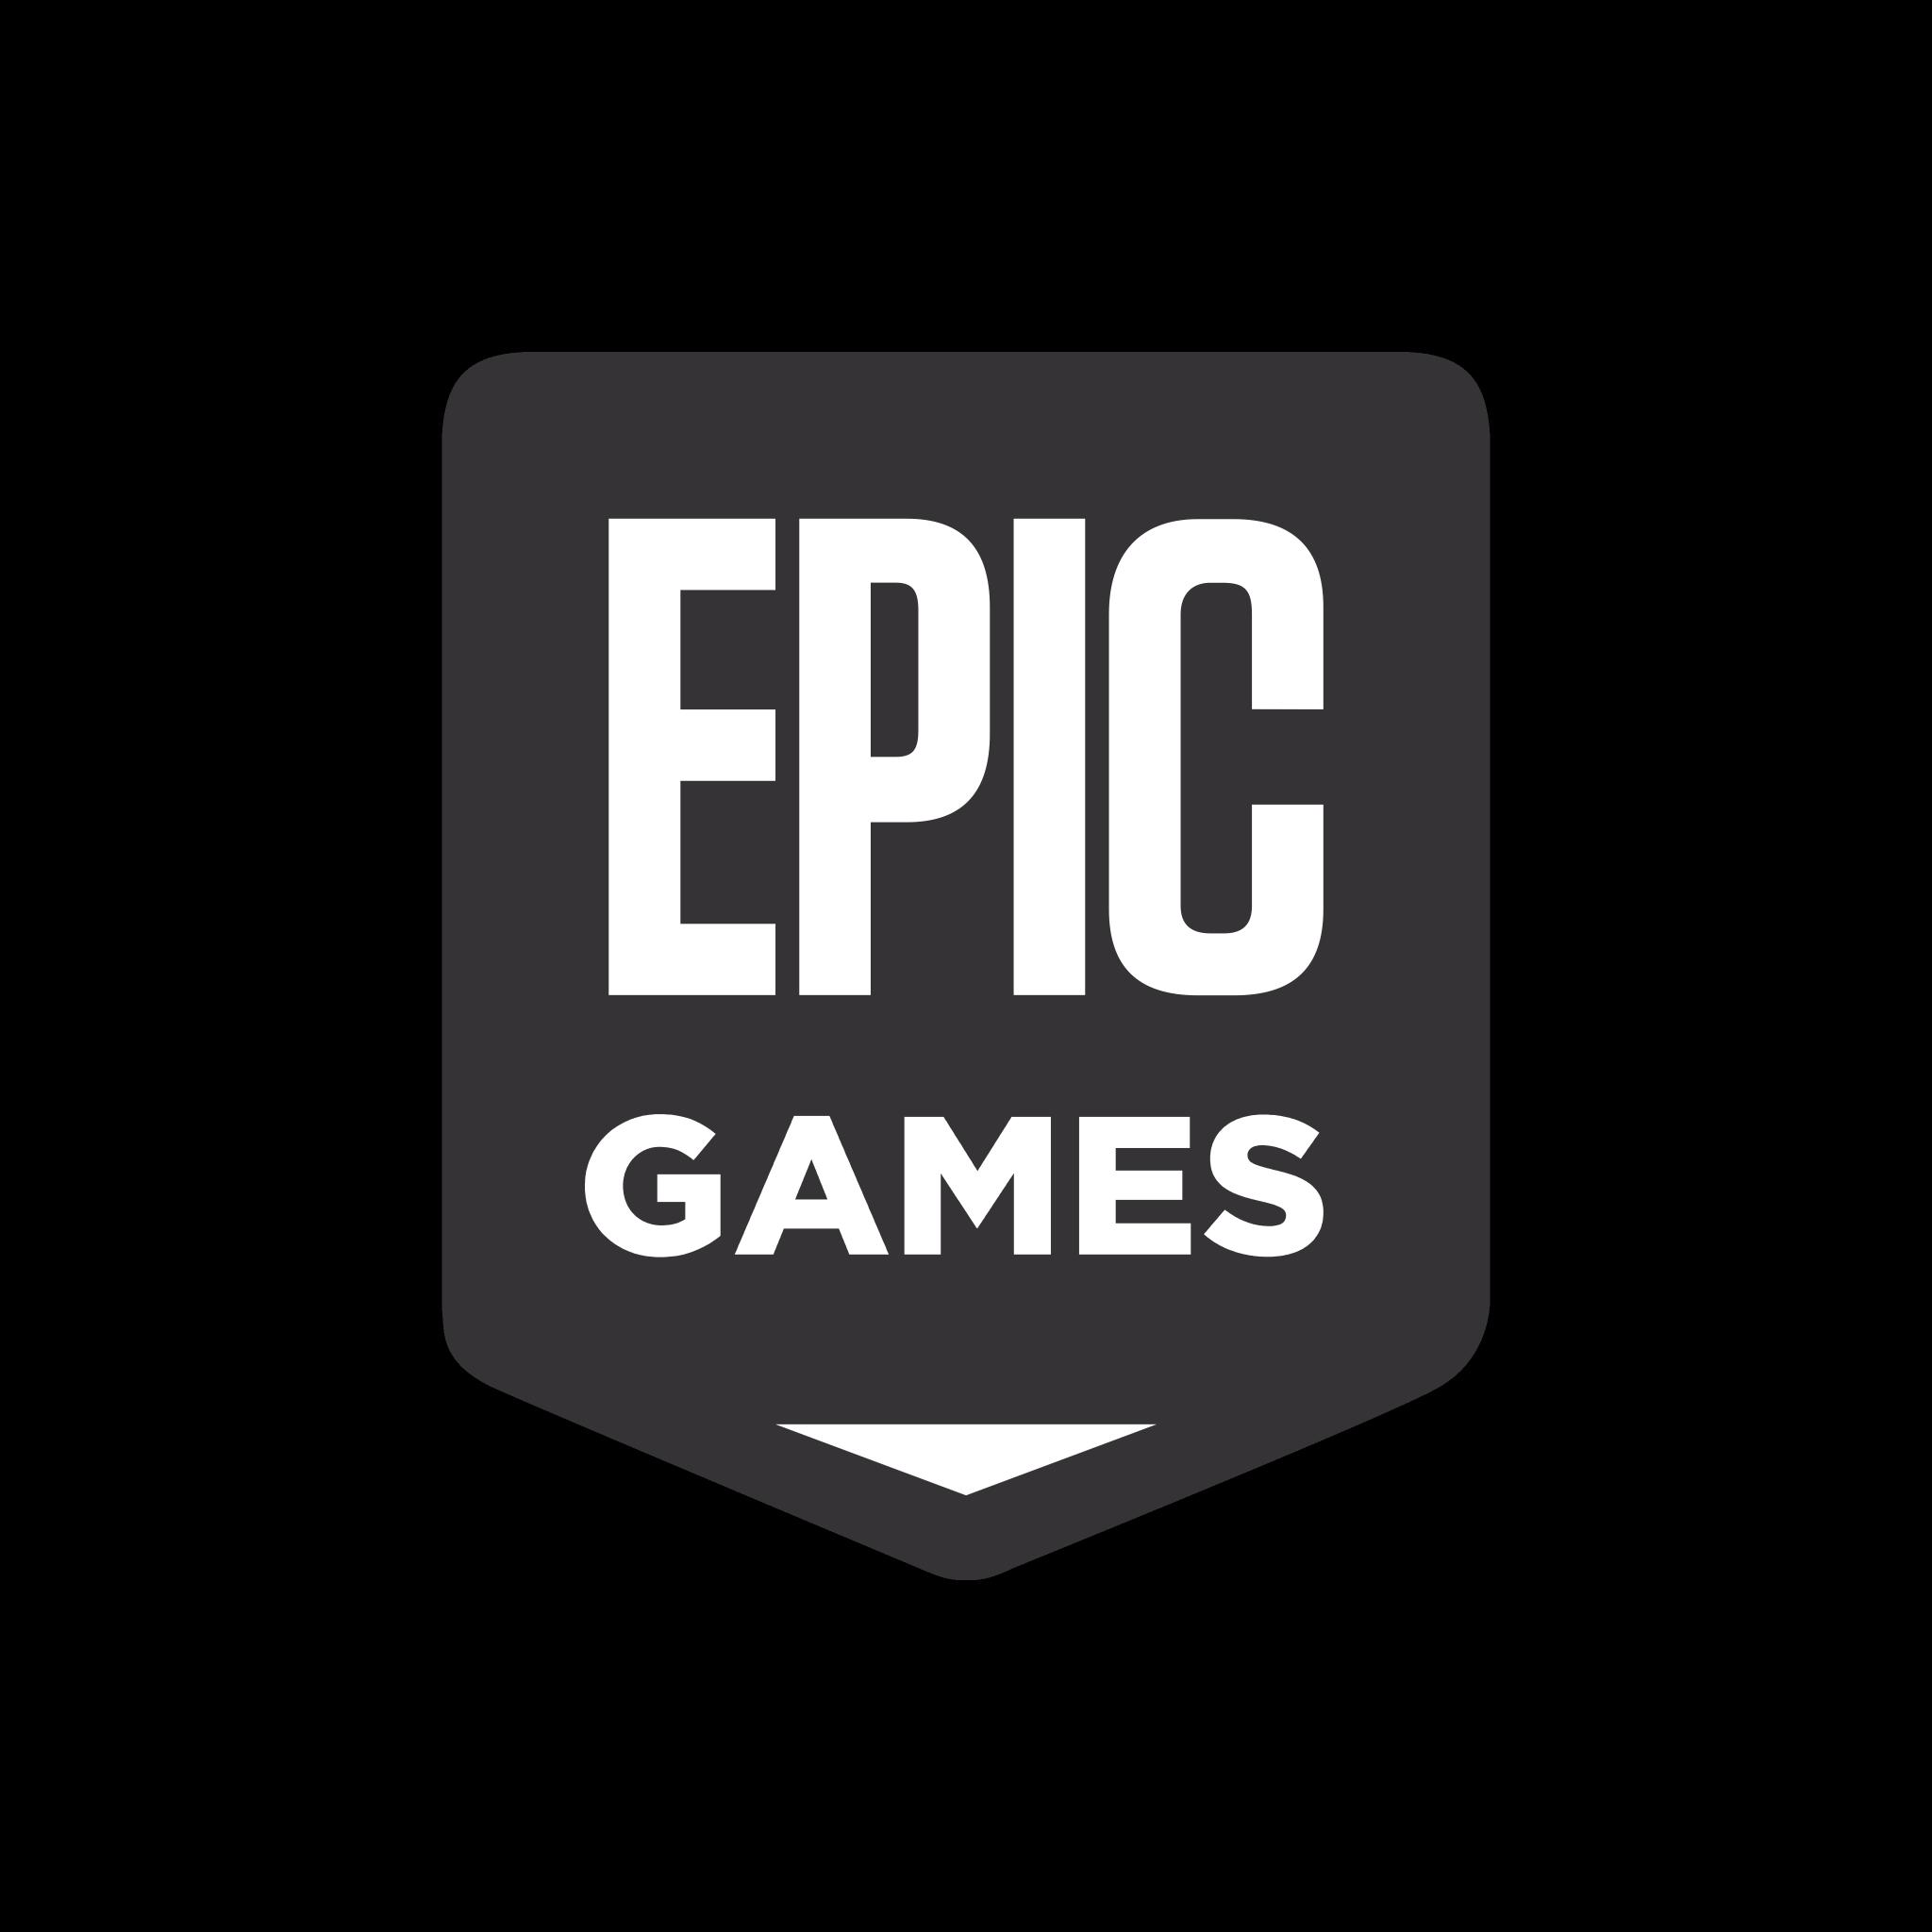 Logo EPIC GAMES: valor, histria, png, vector